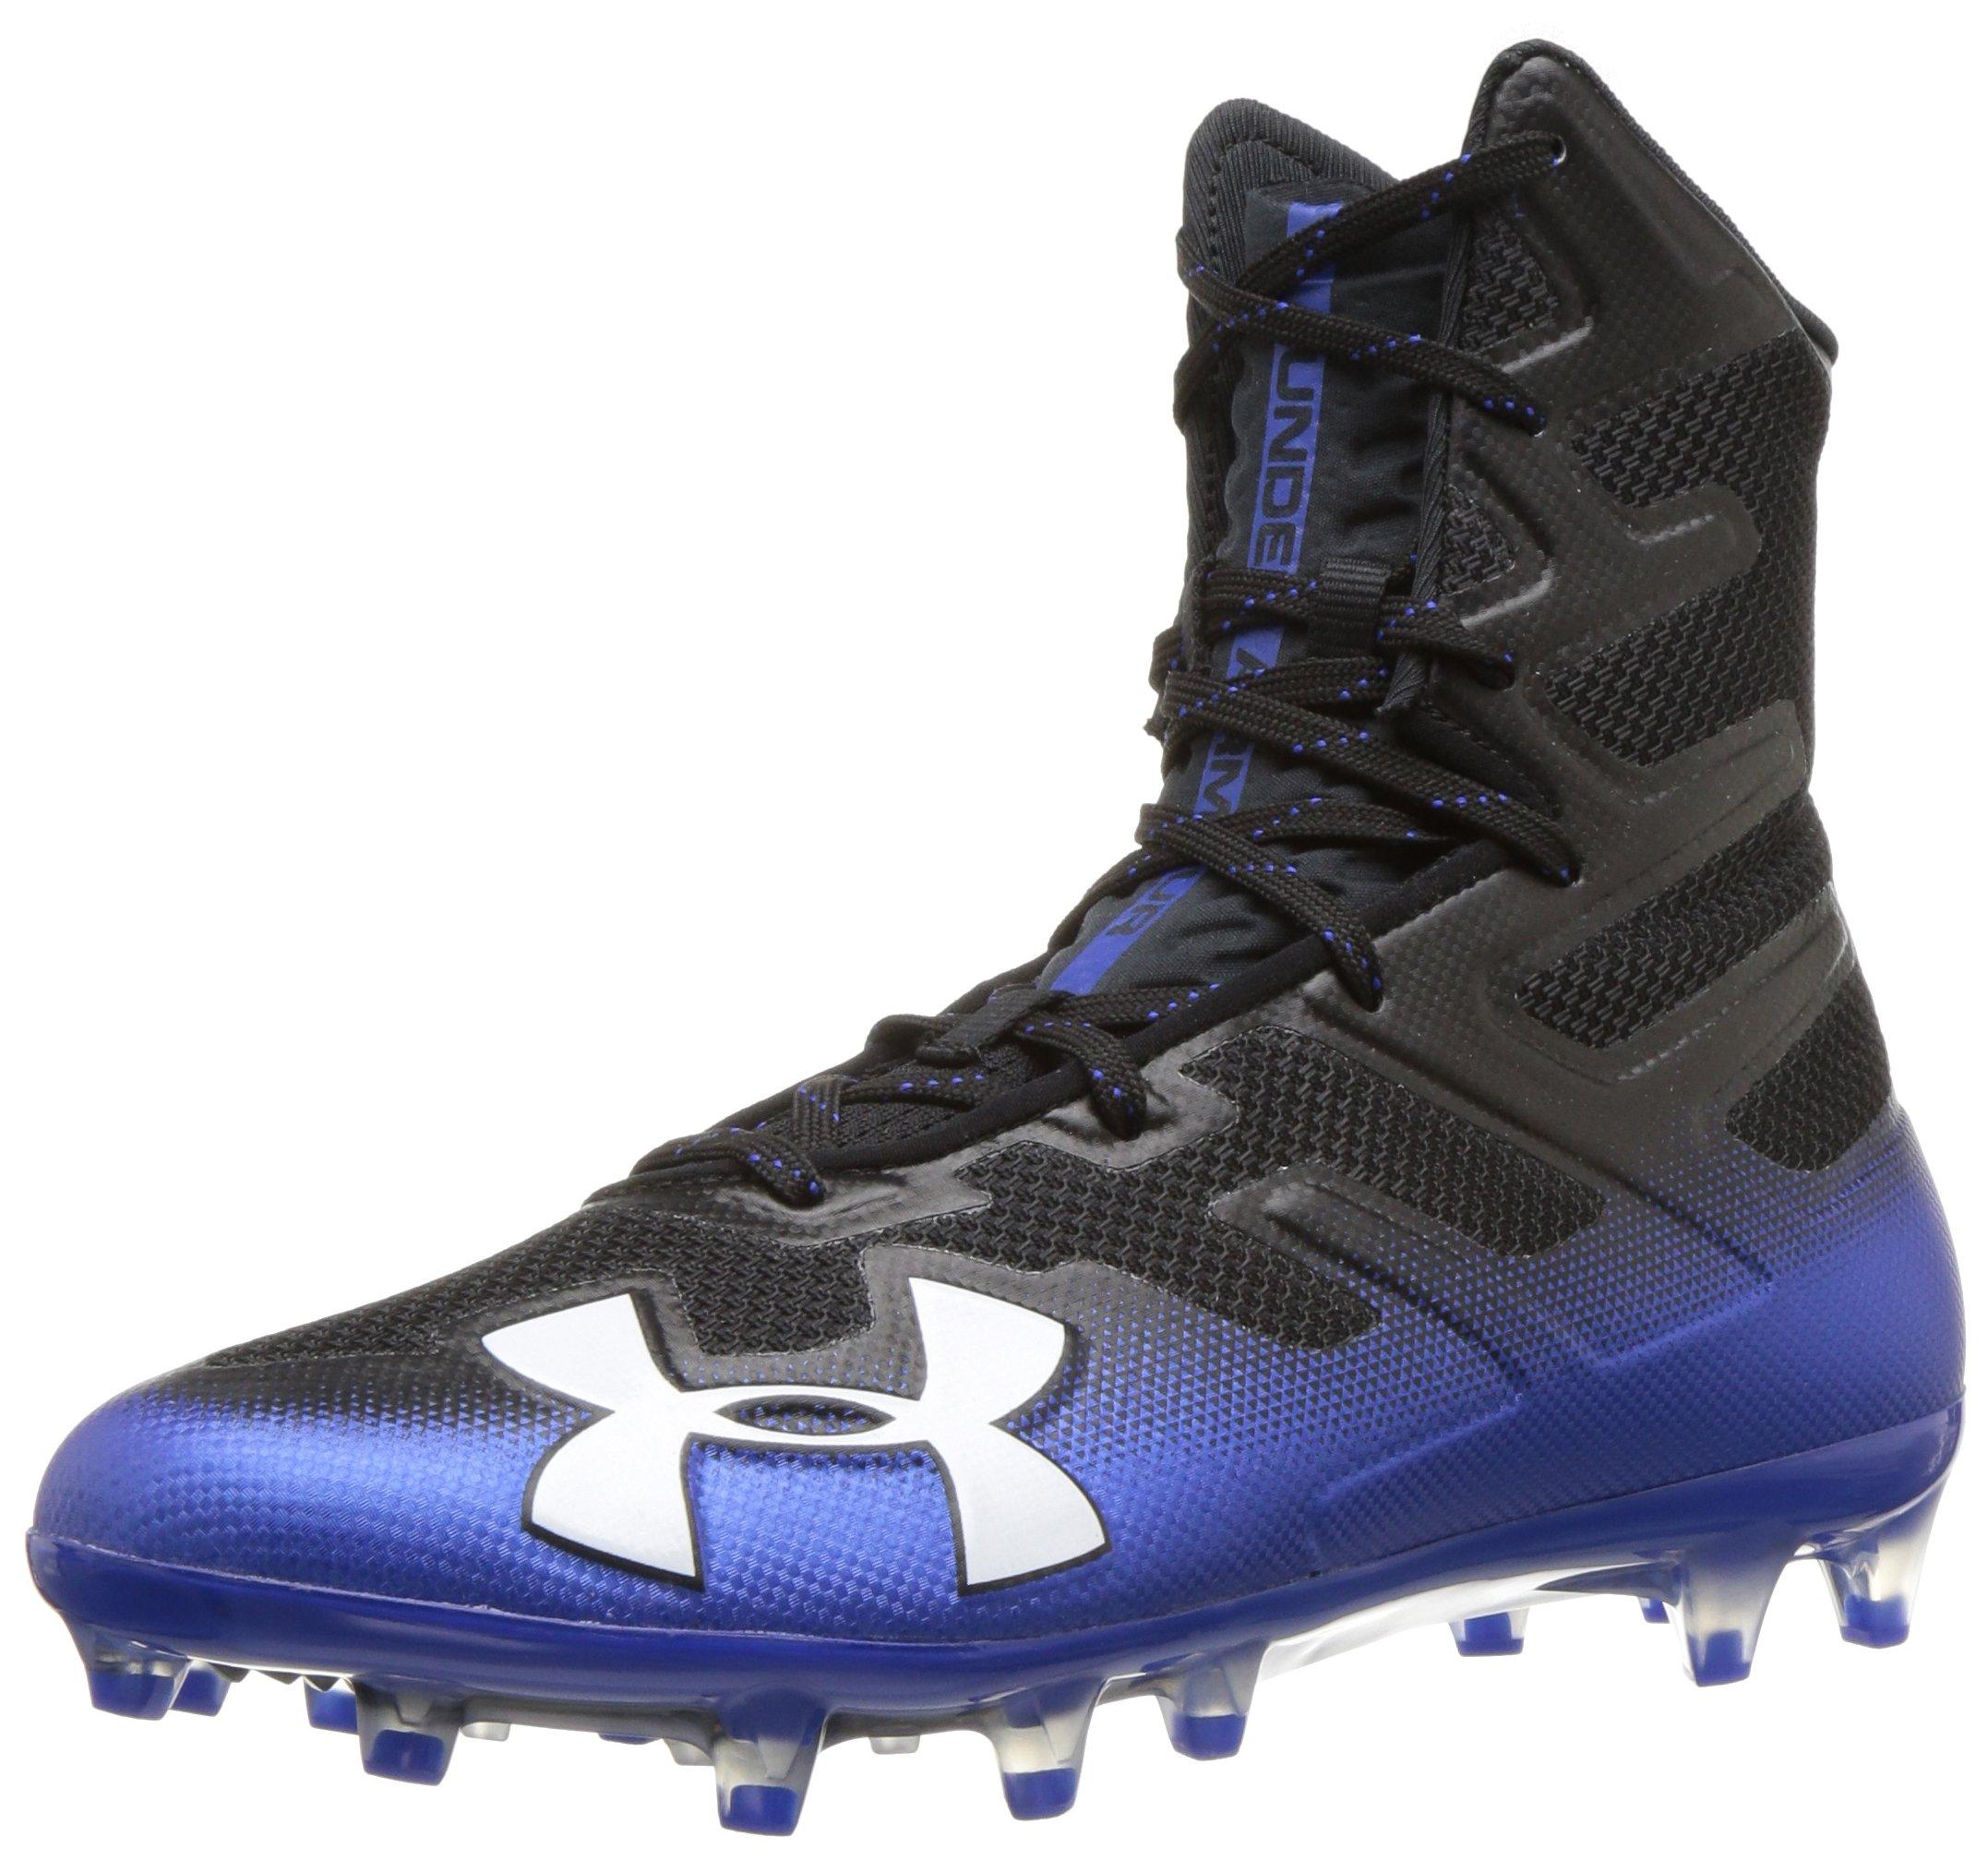 Under Armour Men's Highlight MC Football Shoe, Black (006)/Team Royal, 6.5